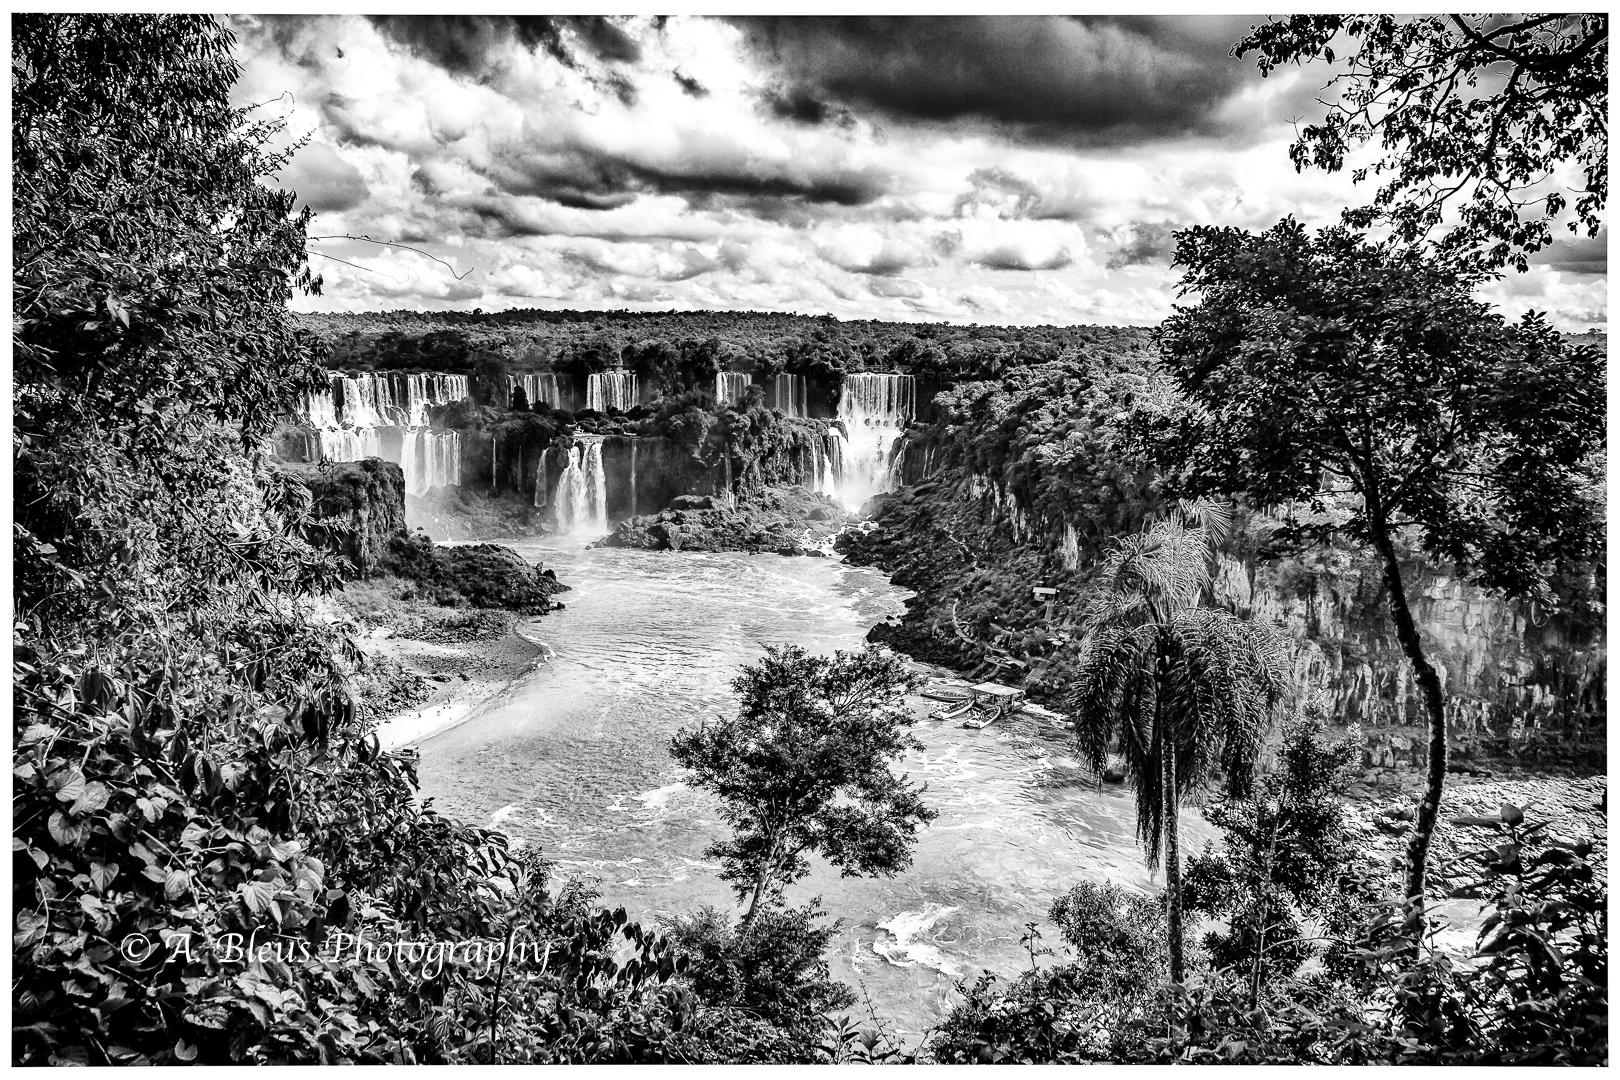 Iguazu Falls, Brazilian side MG_9371-6